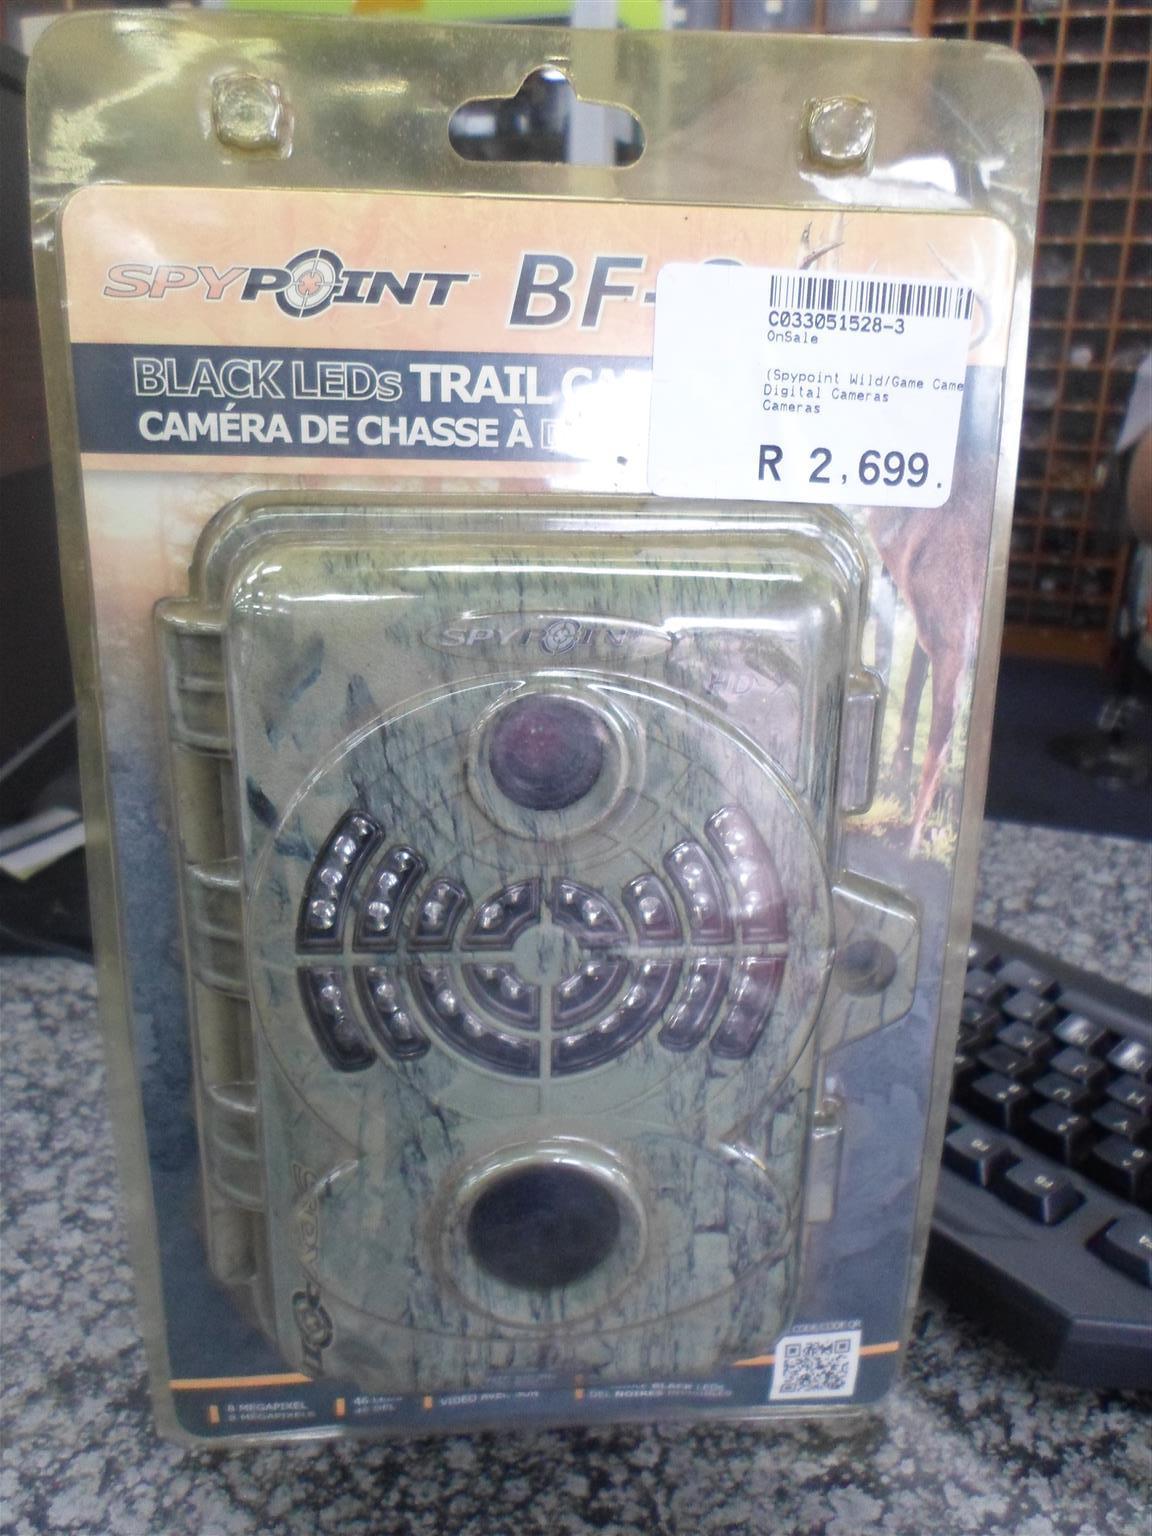 SpyPoint BF-8 Trail Camera - C033051528-3